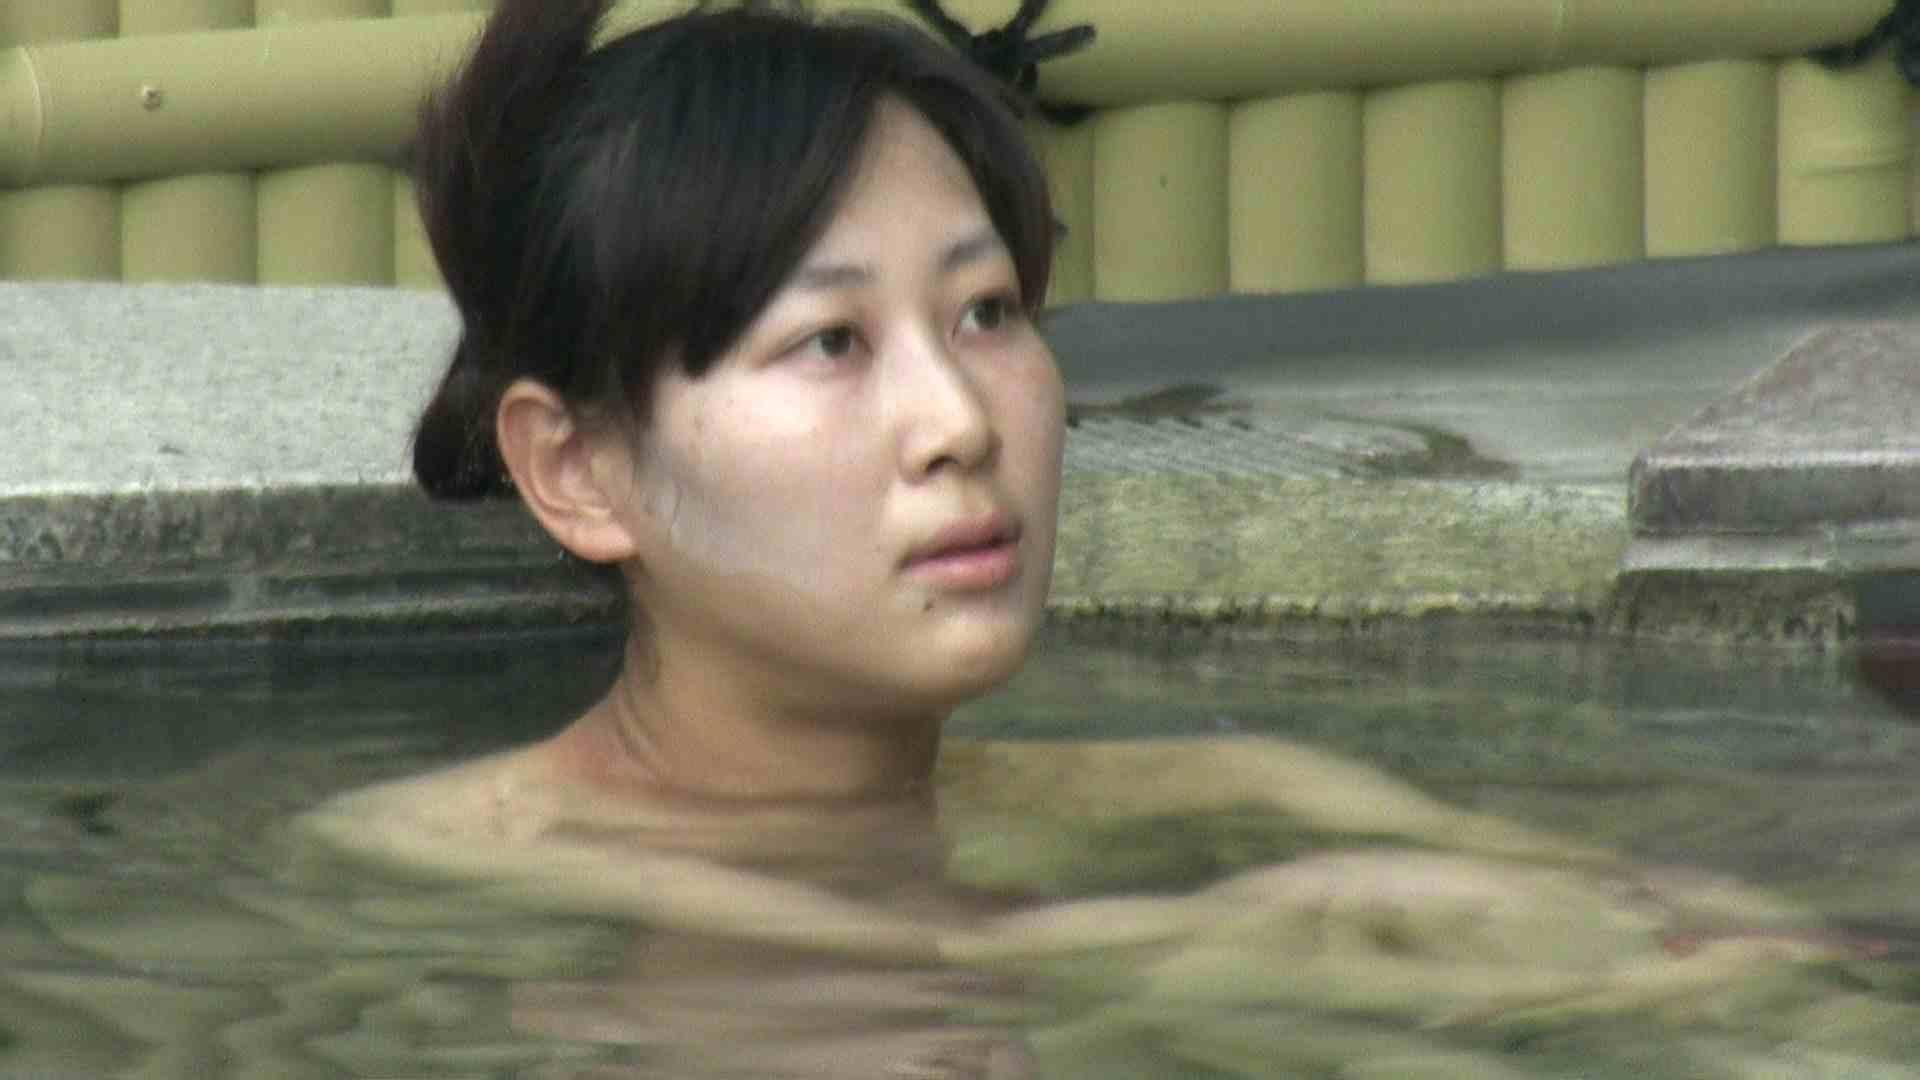 Aquaな露天風呂Vol.665 HなOL   盗撮  104pic 44